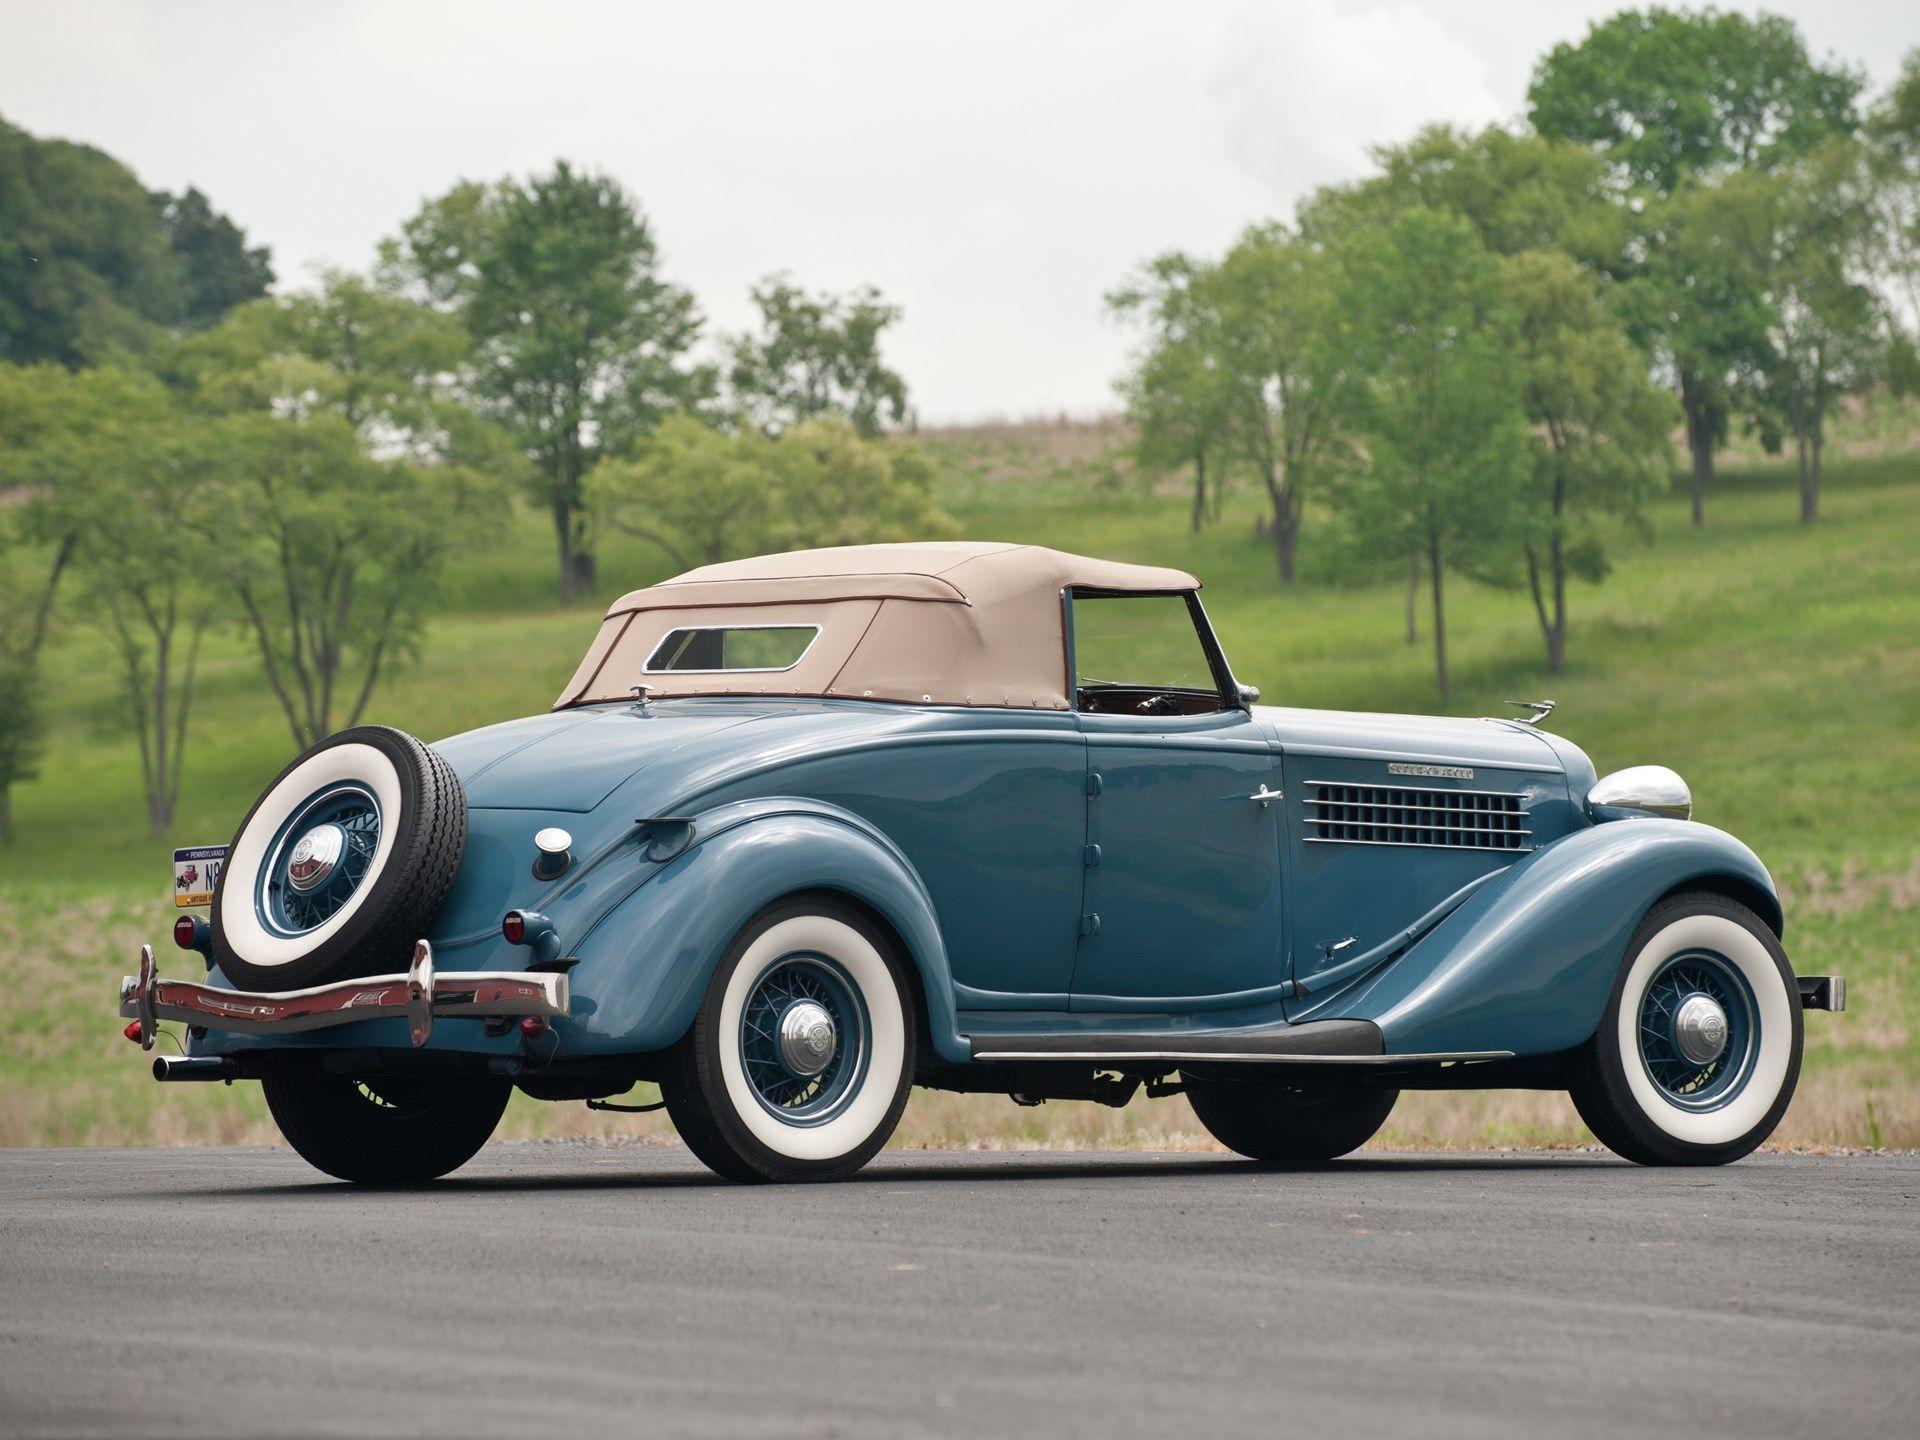 1936 Auburn 852SC Cabriolet Classic cars, Cabriolets, Auburn